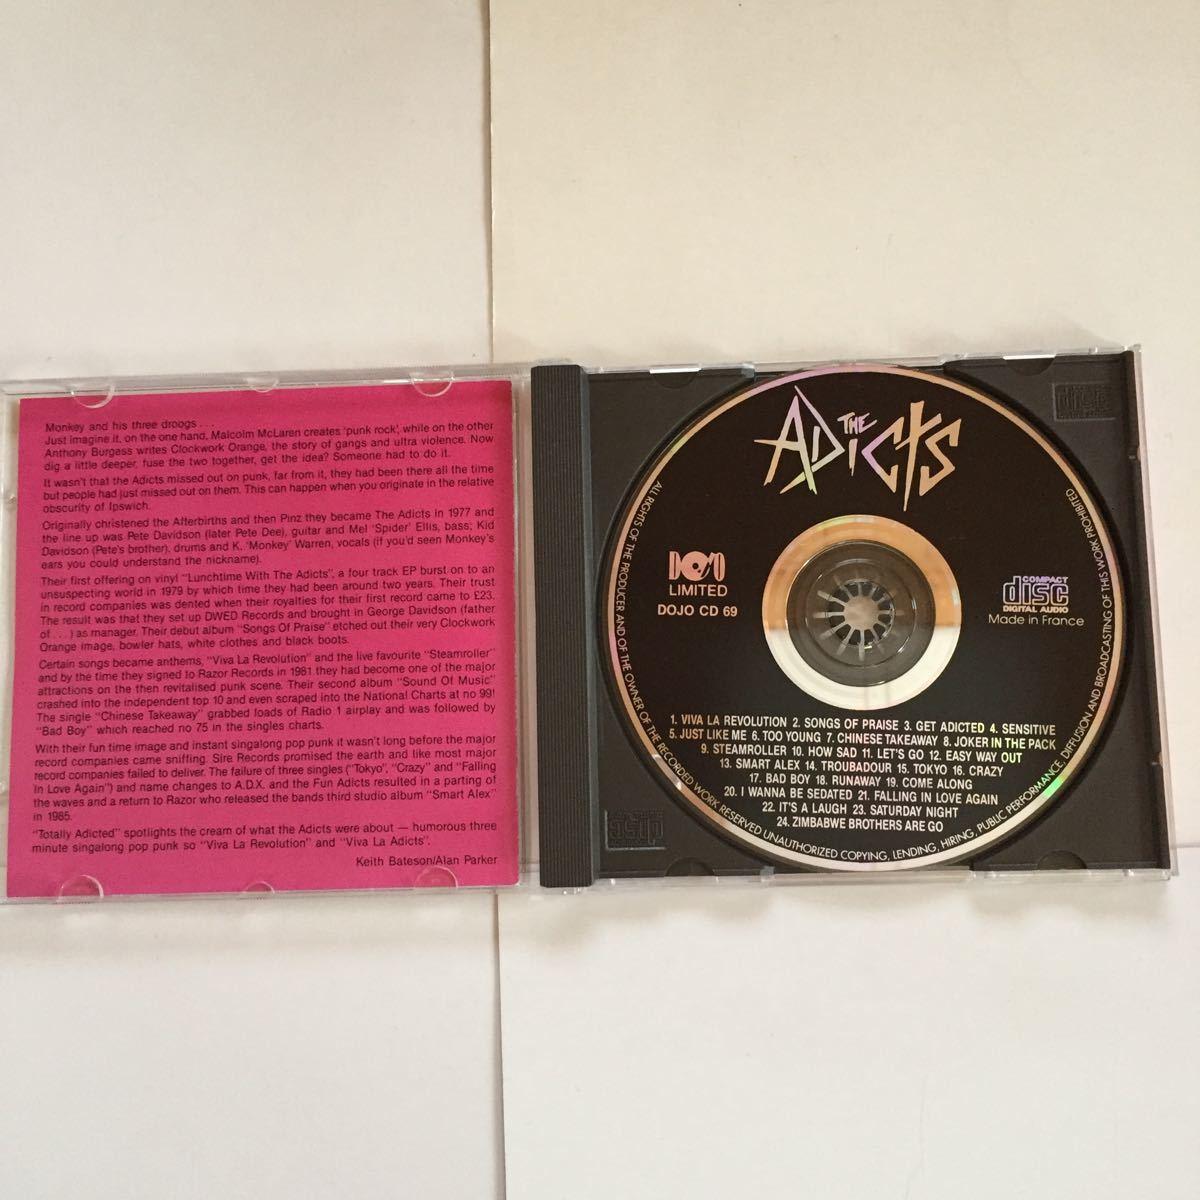 THE ADICTS BEST アディクツ ベスト 札幌のディスコで流行ったTOKYO収録 釈迦曼荼羅 ラモーンズ マレーネ・デートリッヒのカヴァー曲収録